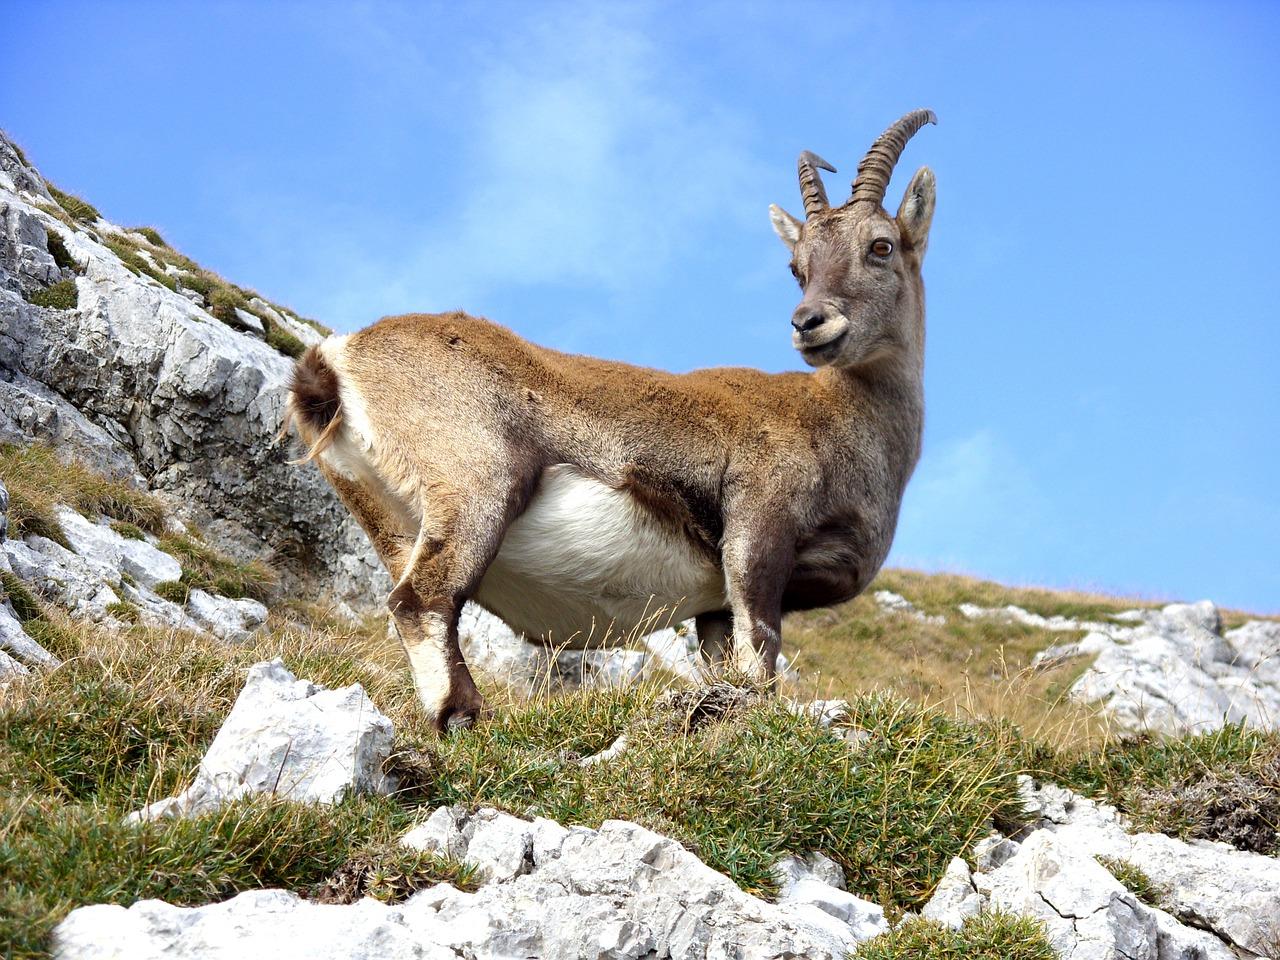 goat-940896_1280